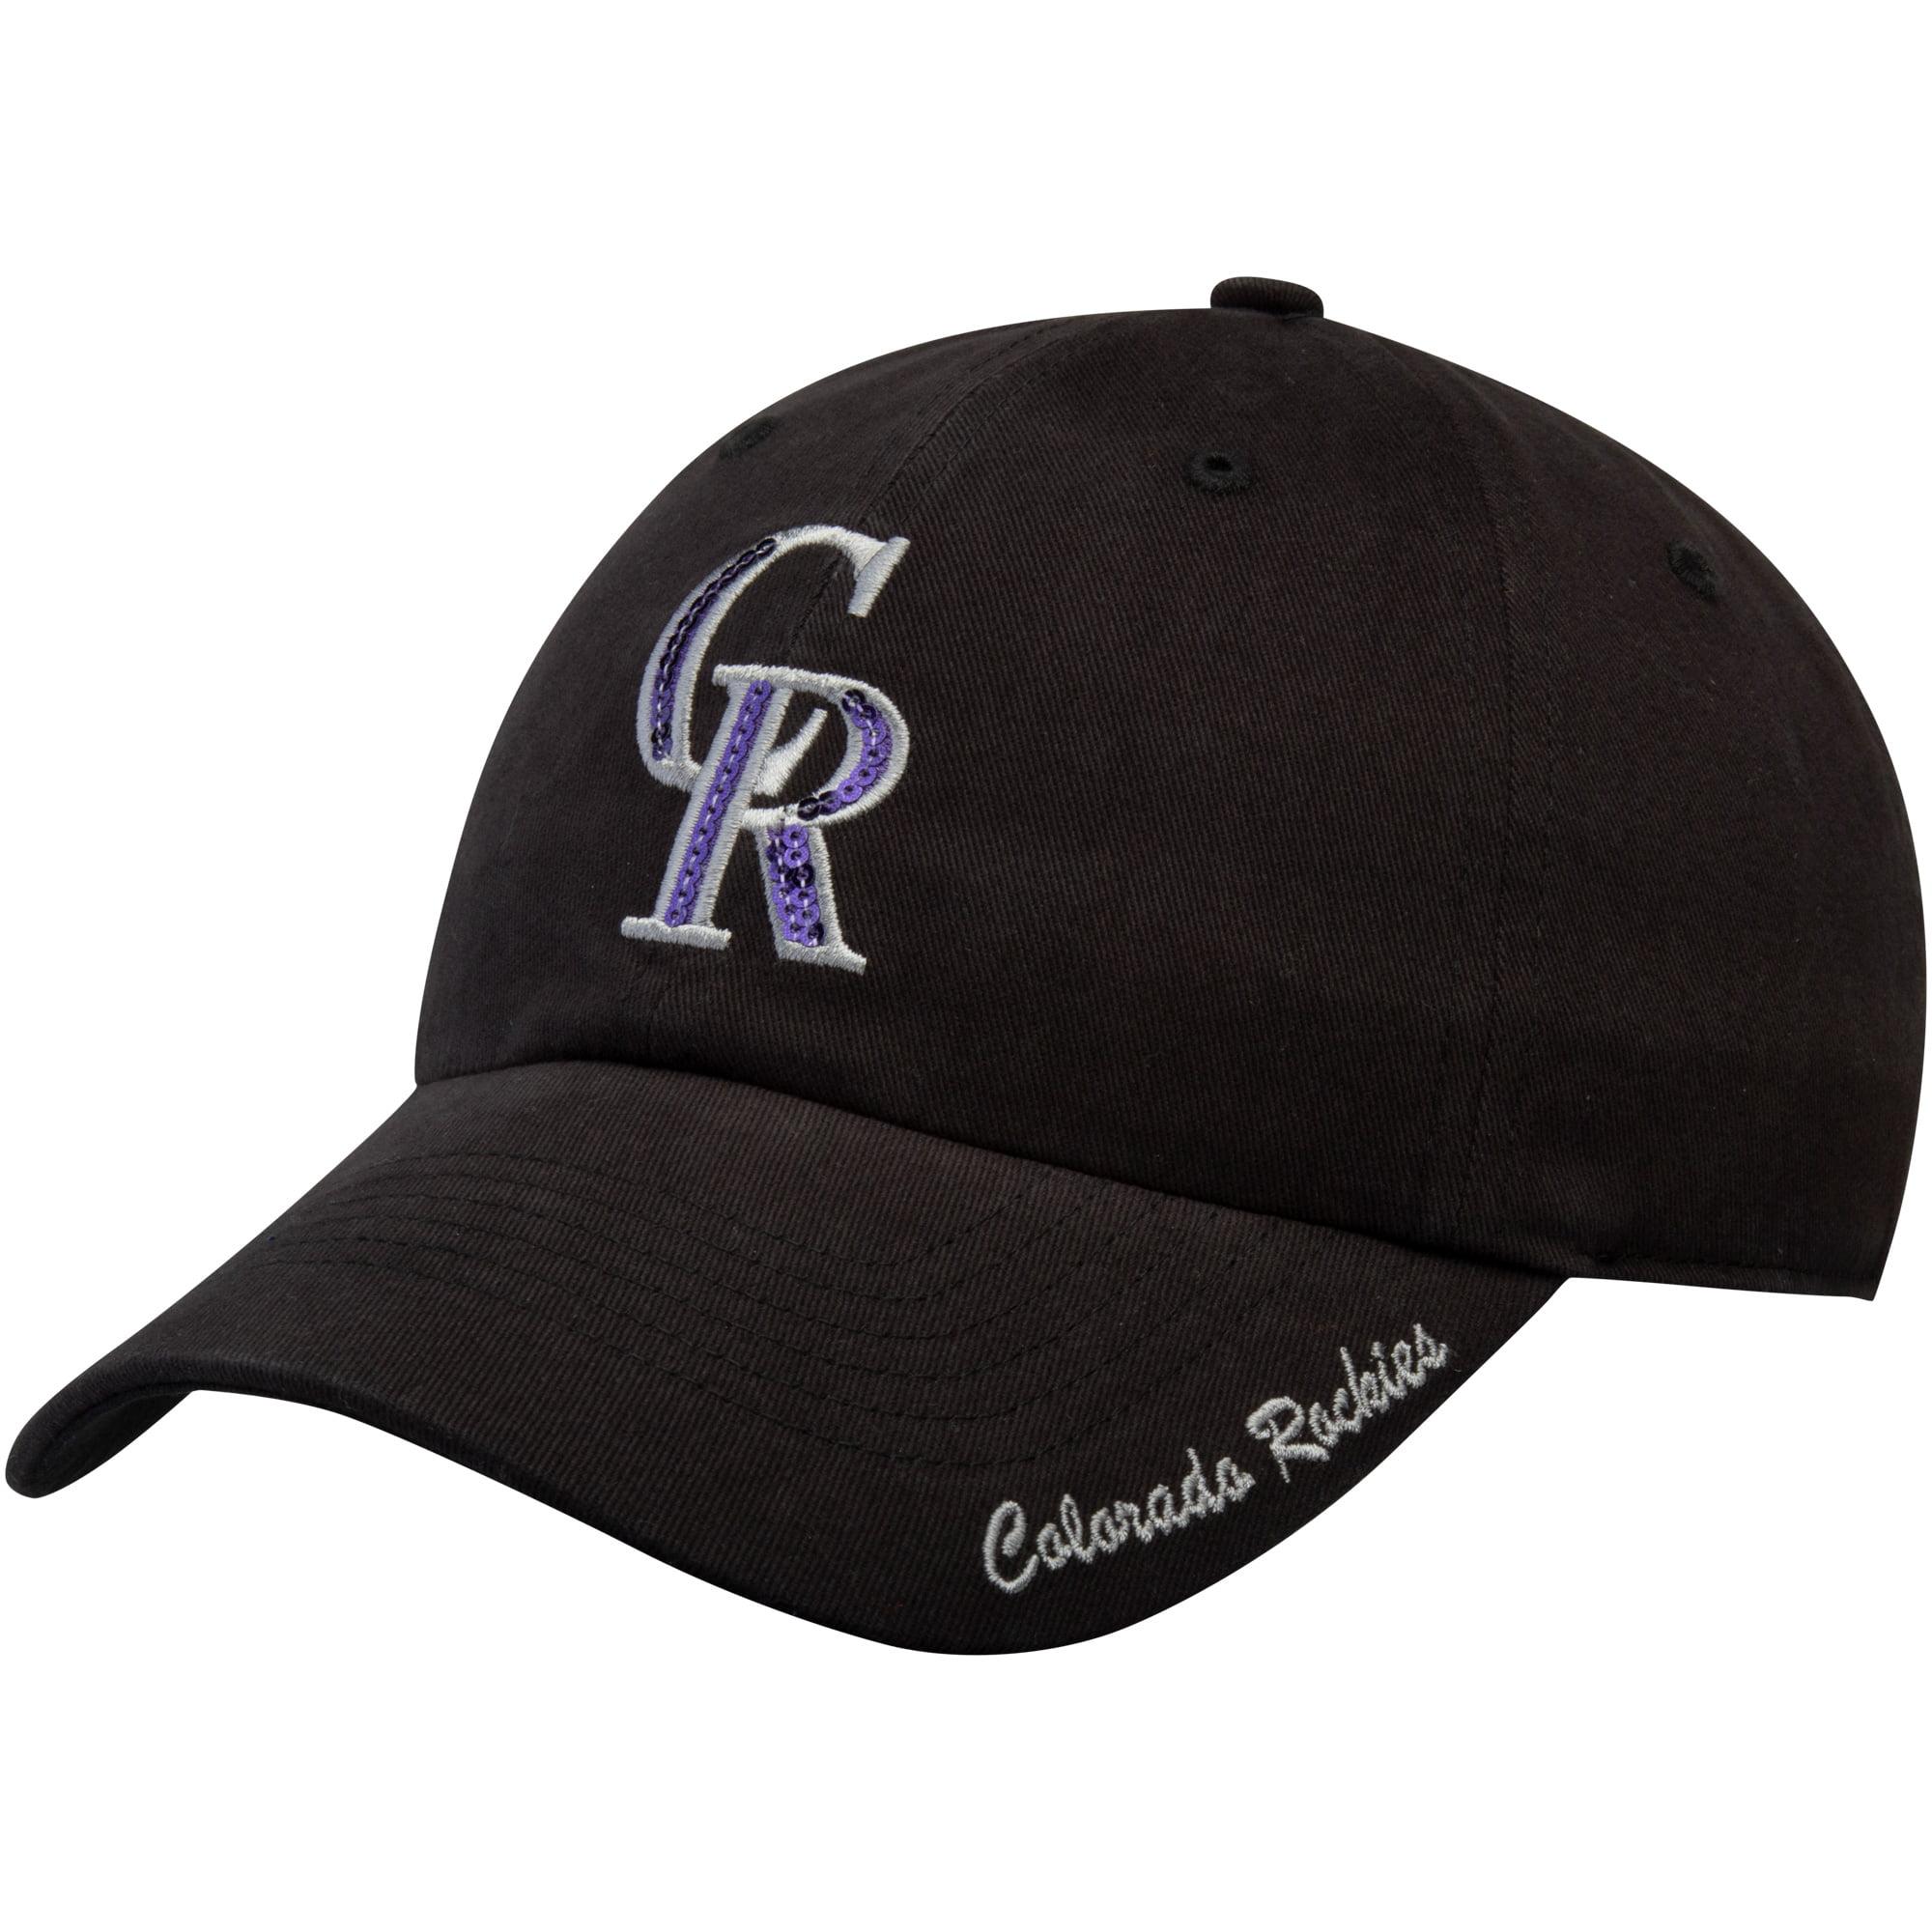 Women's Fan Favorite Black Colorado Rockies Sparkle Adjustable Hat - OSFA